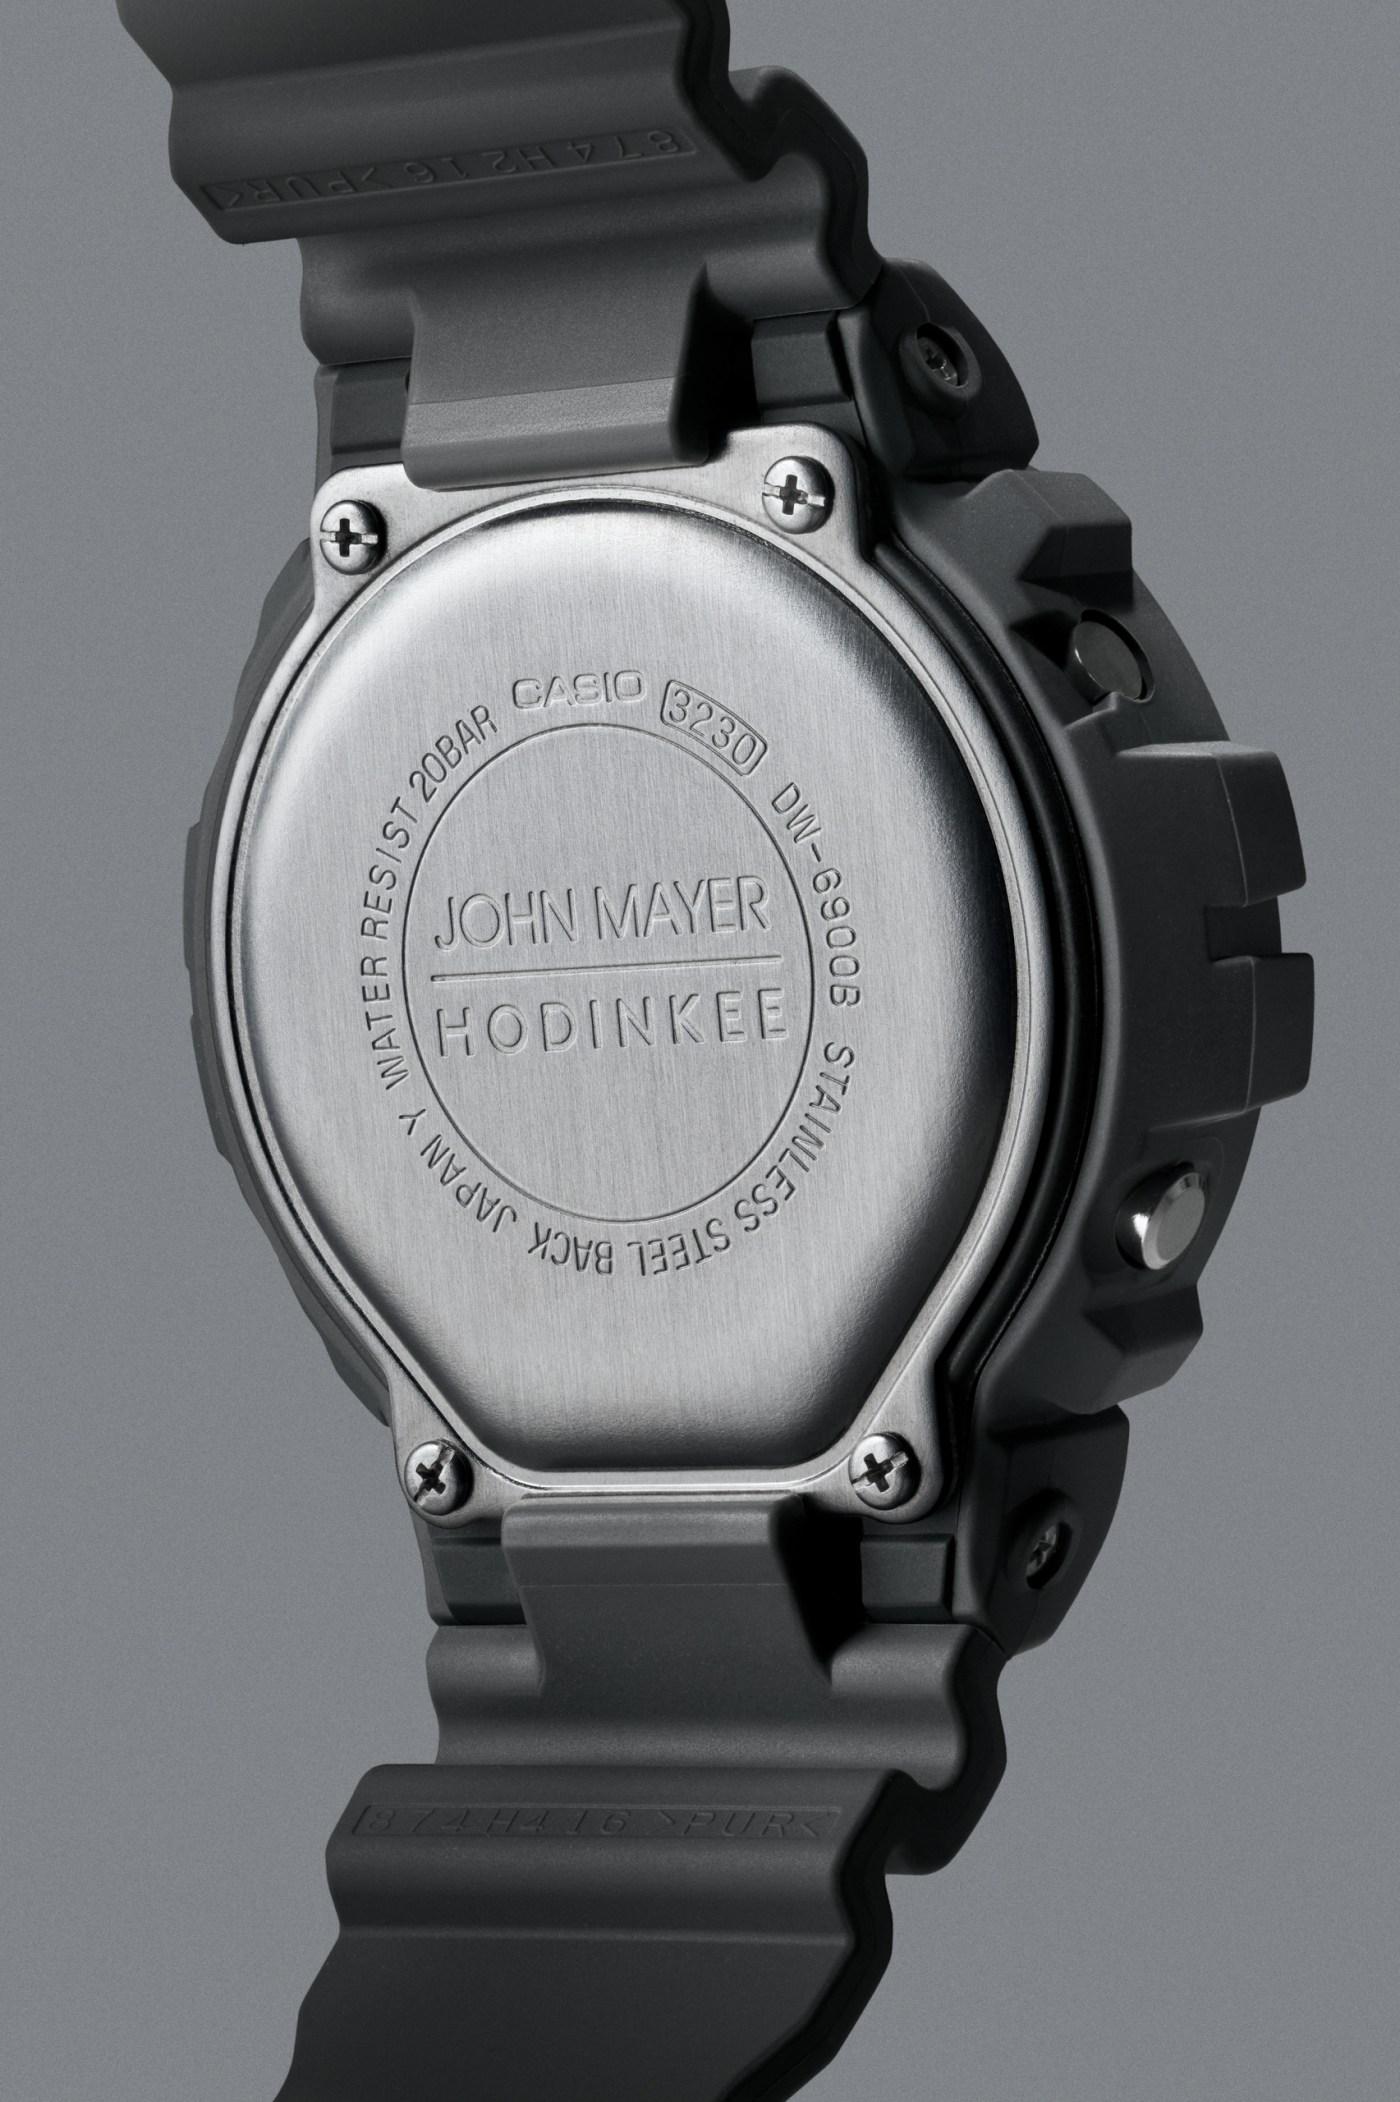 Casio G-Shock x Hodinkee Ref. 6900 John Mayer caseback